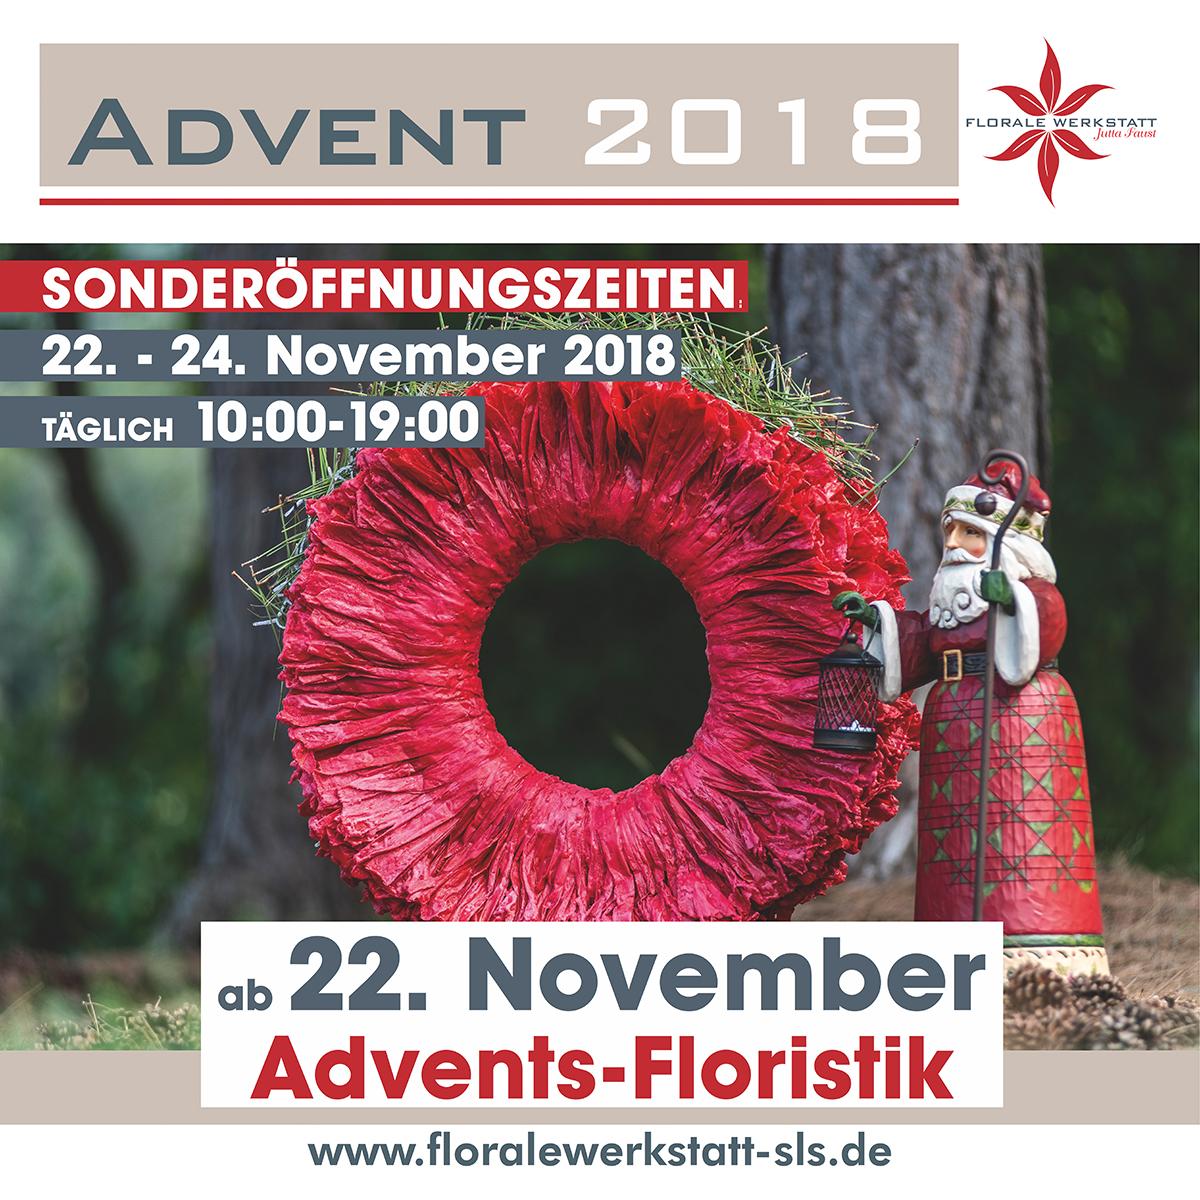 Facebook_Florale2018_Advent.jpeg